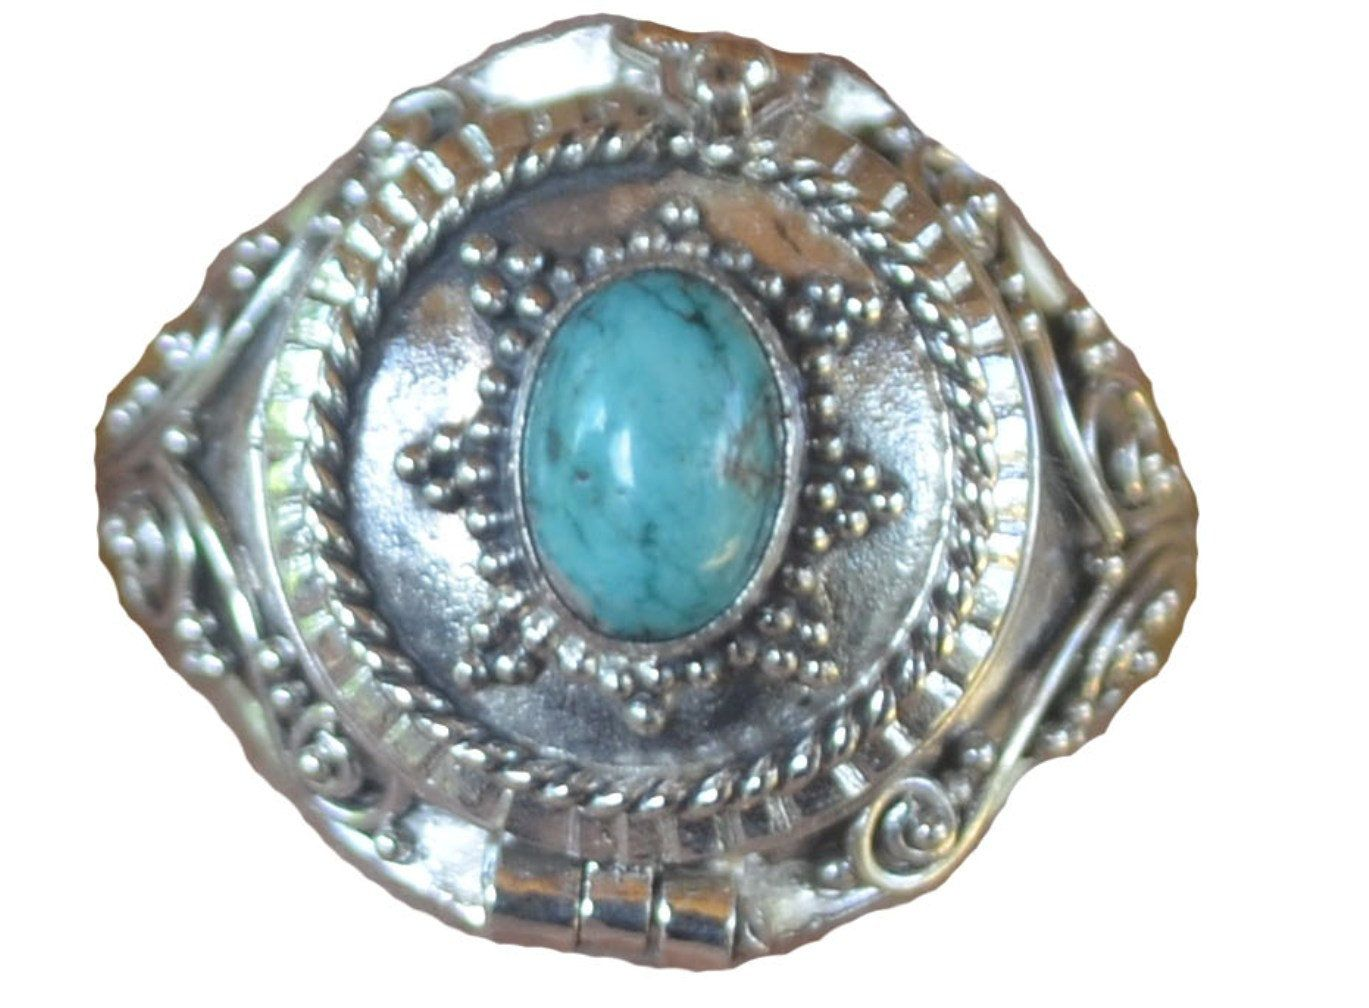 30mm L Light Blue// Teal Triple Flower Crystal Floral Brooch In Gold Tone Metal